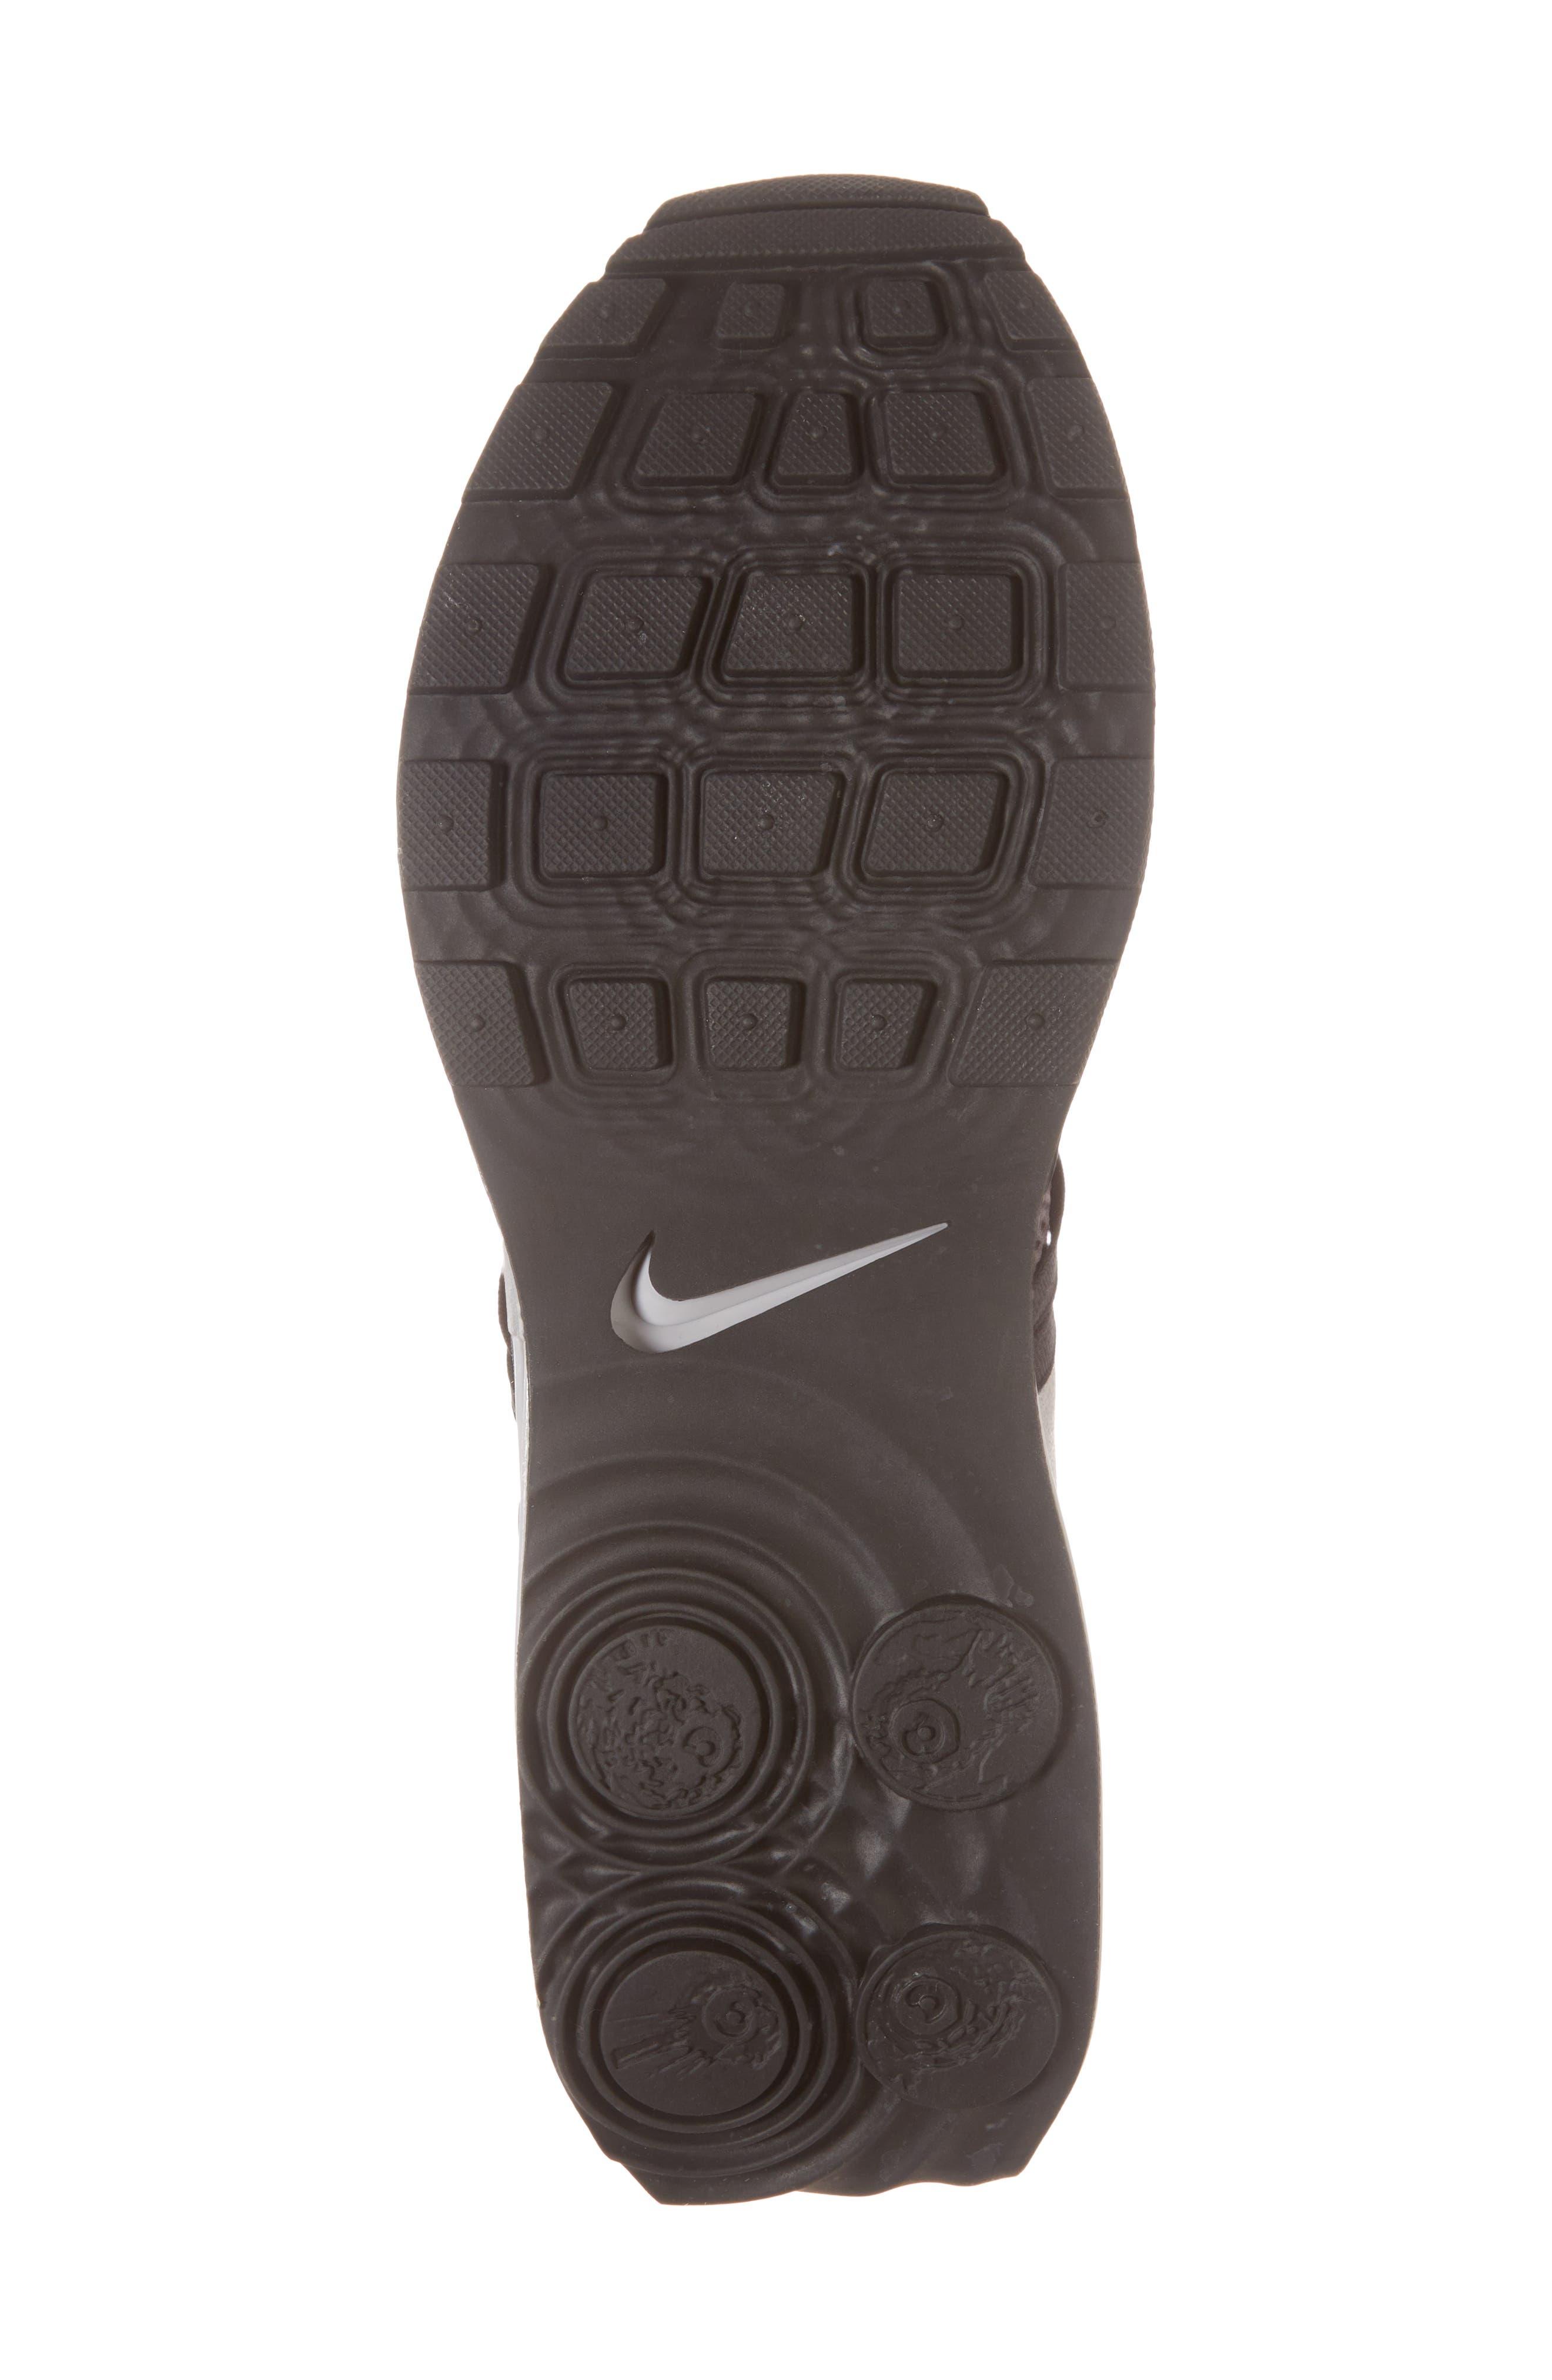 Shox Gravity Sneaker,                             Alternate thumbnail 6, color,                             ATMOSPHERE GREY/ BLACK/ GREY